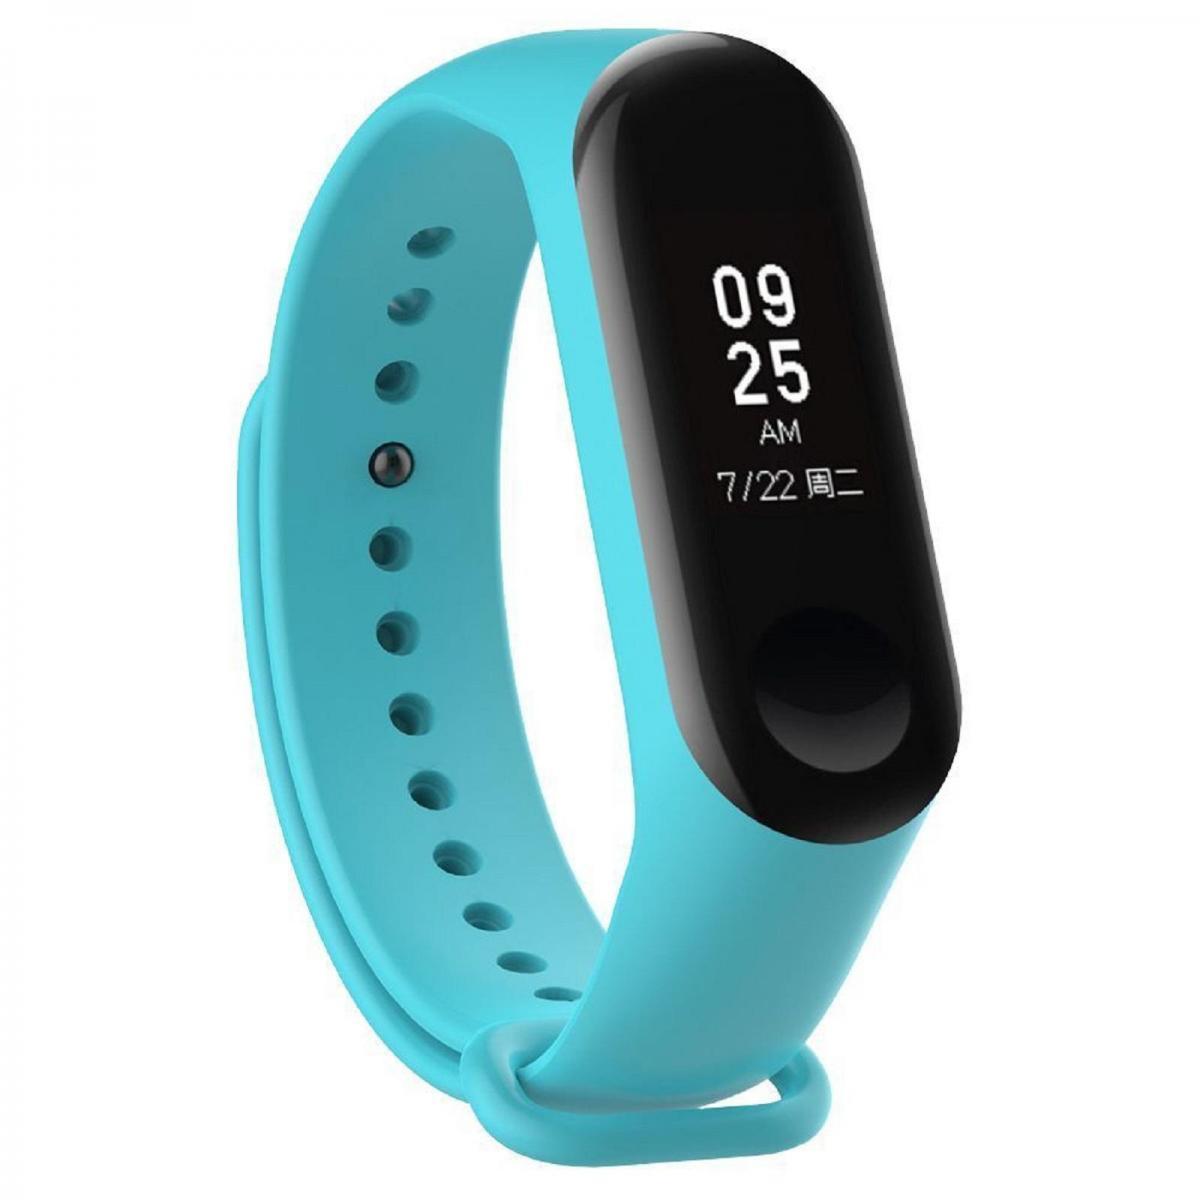 ebcef70db128 Recambio de correa de silicona para pulsera reloj Xiaomi Mi Band 2